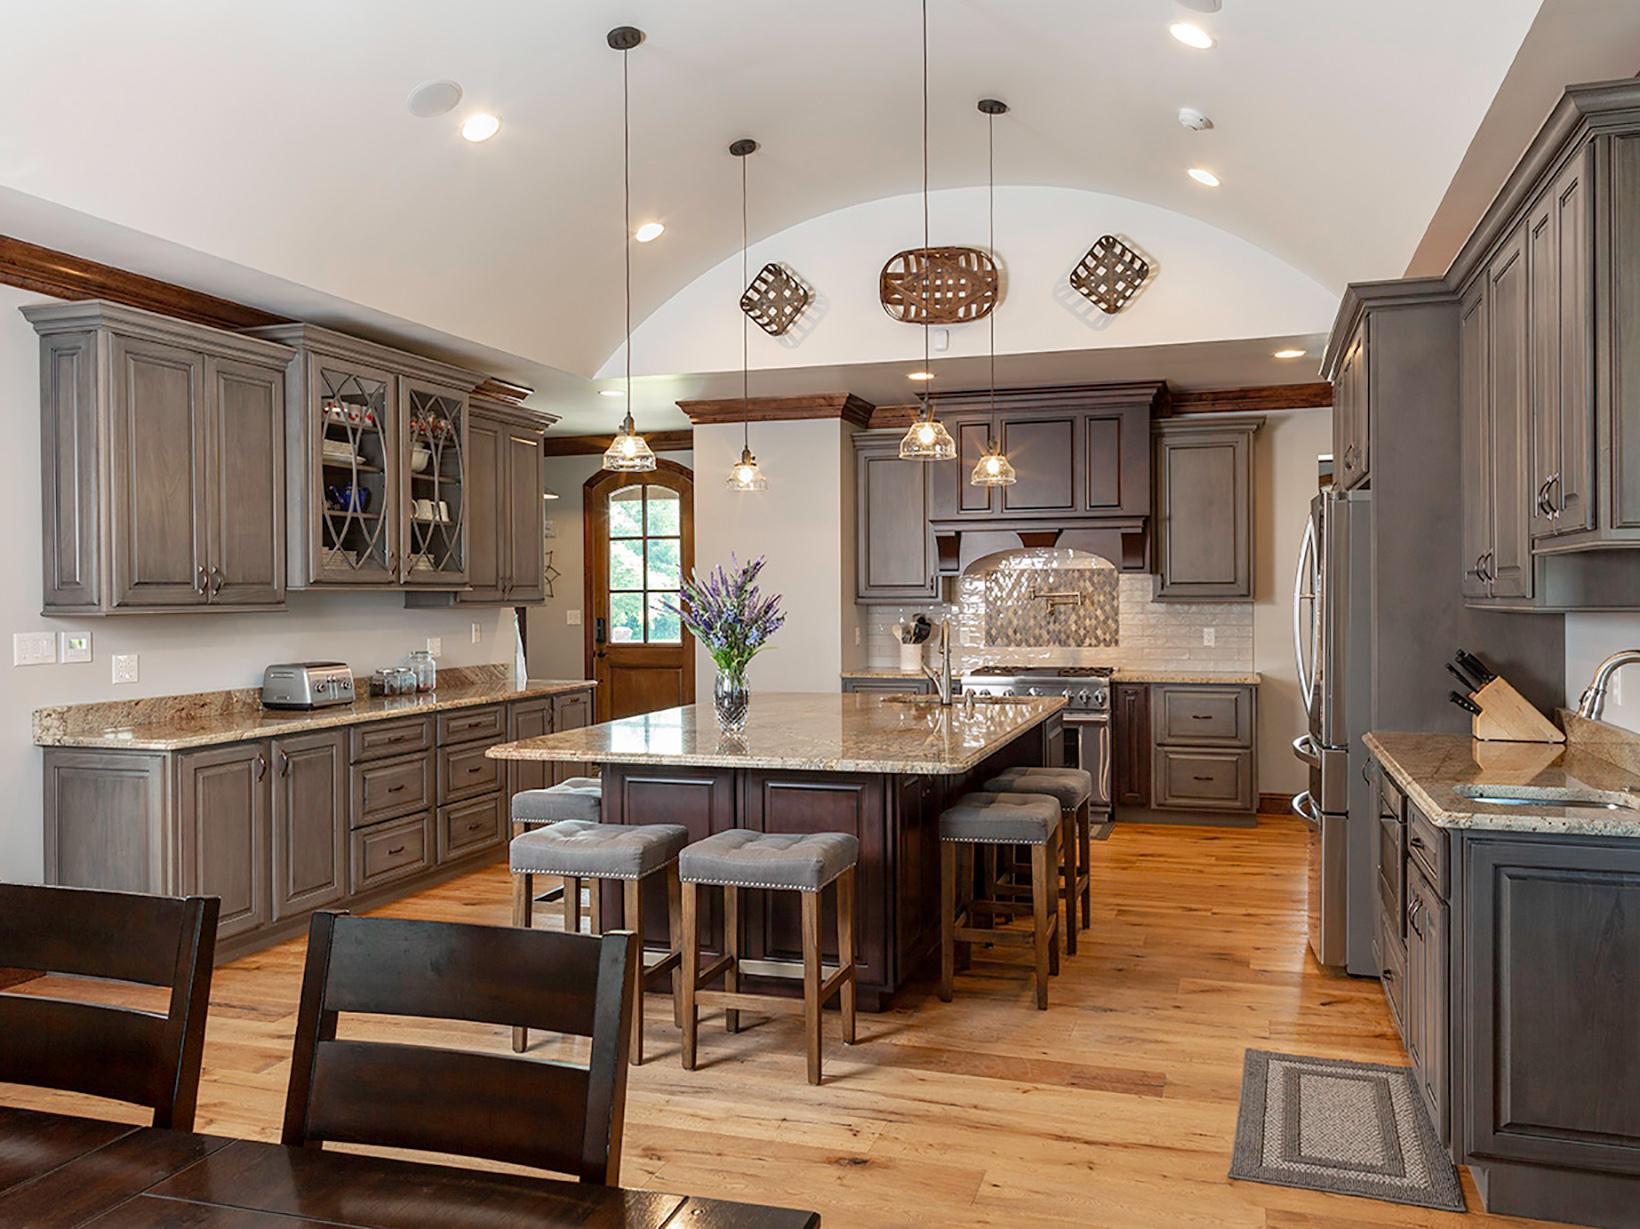 Sterling On American Poplar Standard Overlay Using Square Raised Door Kitchen Cabinets Tiles Nj Art Of Kitchen Tile